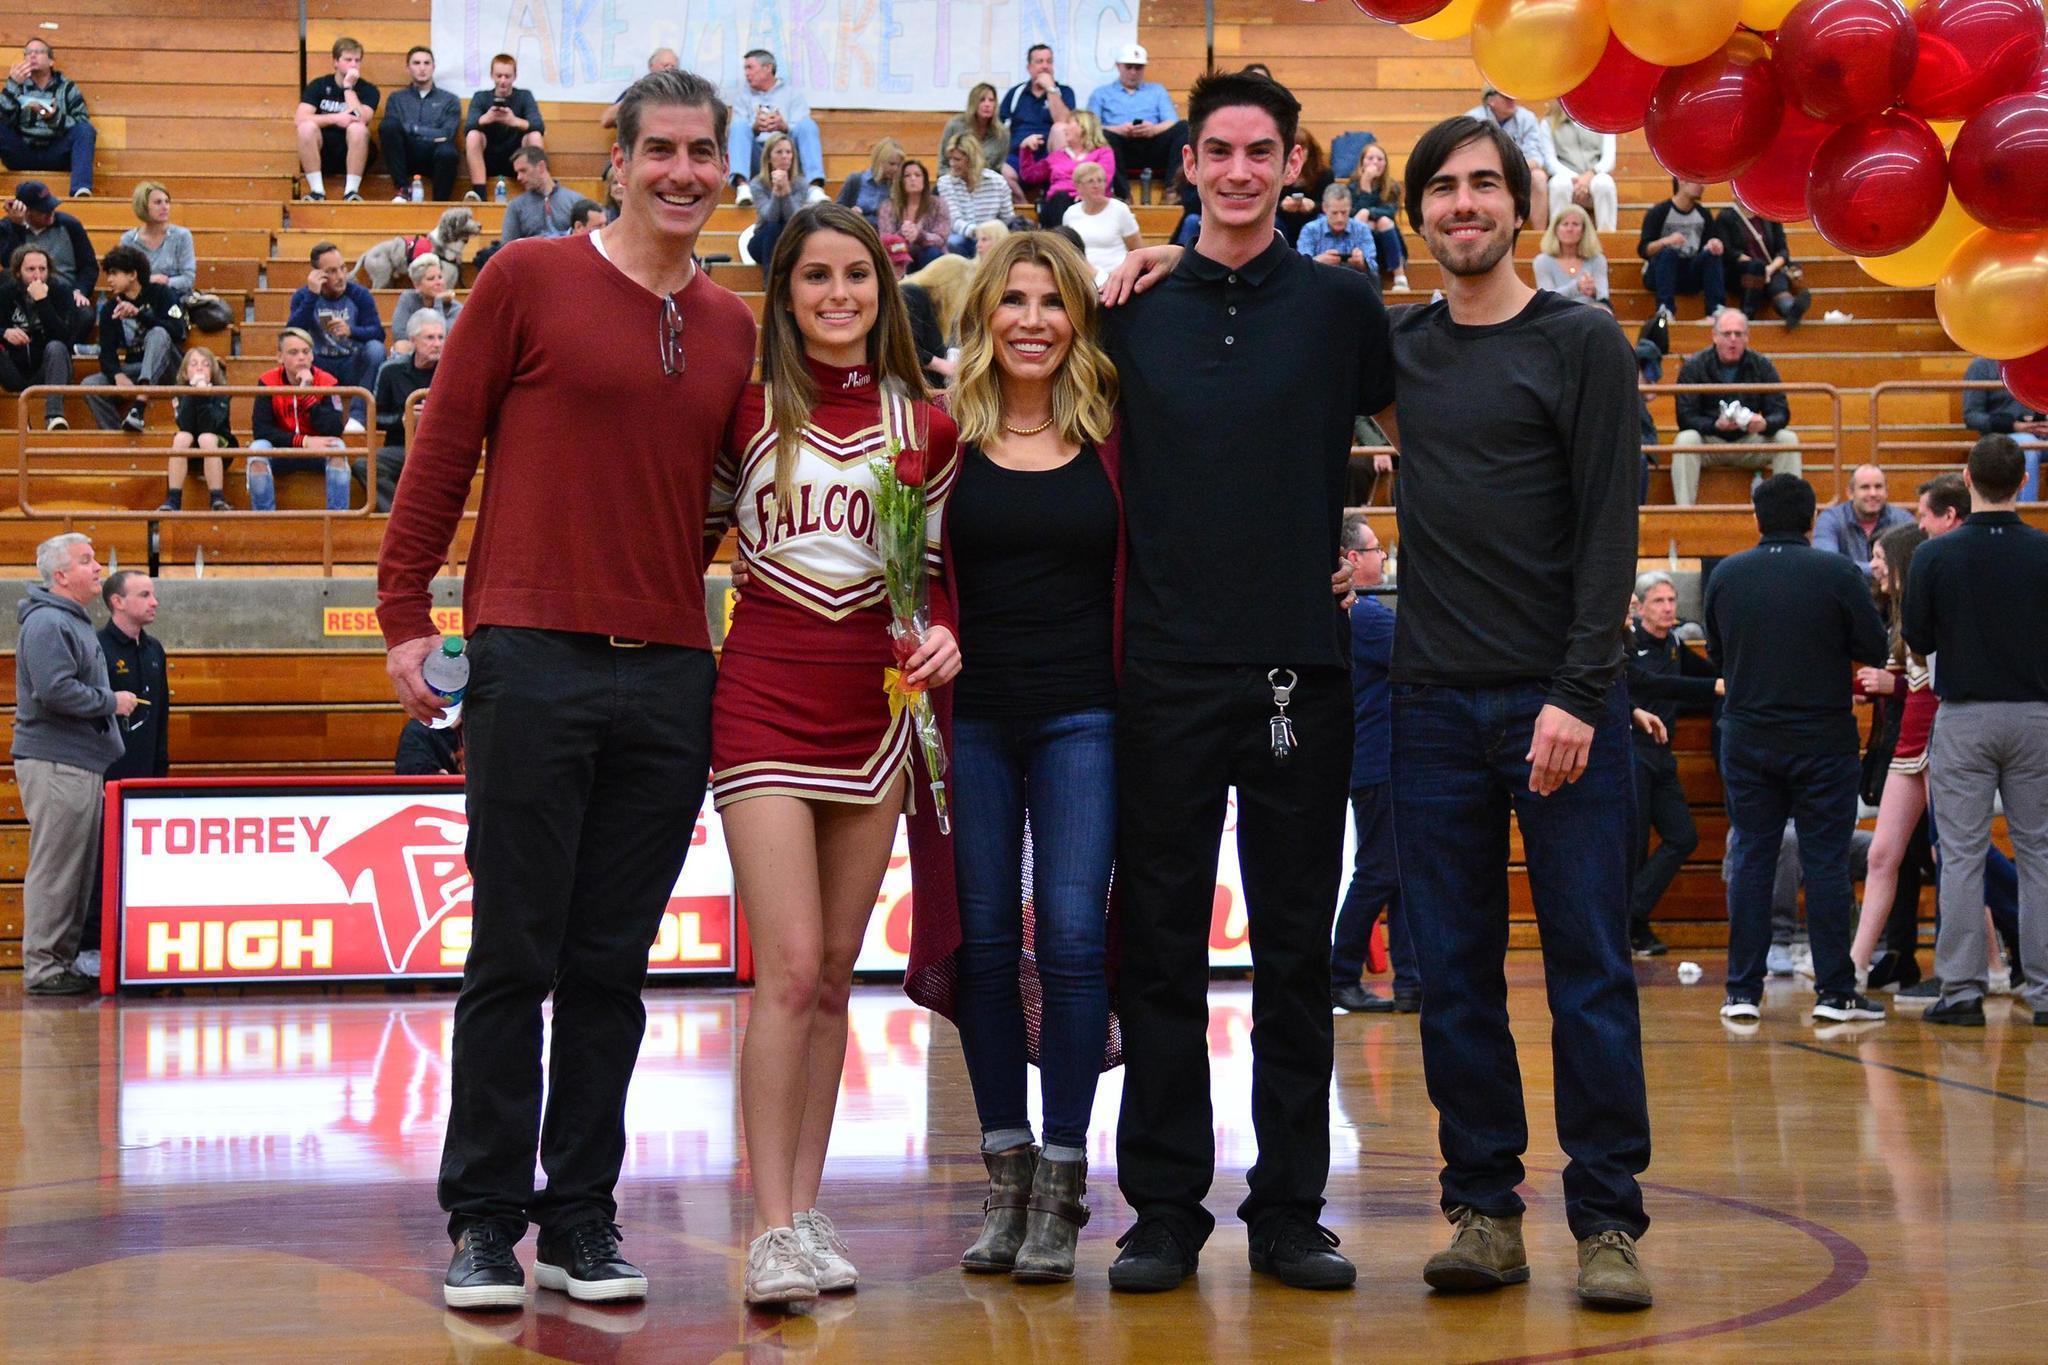 Torrey Pines High School celebrates hoops, cheer seniors ...